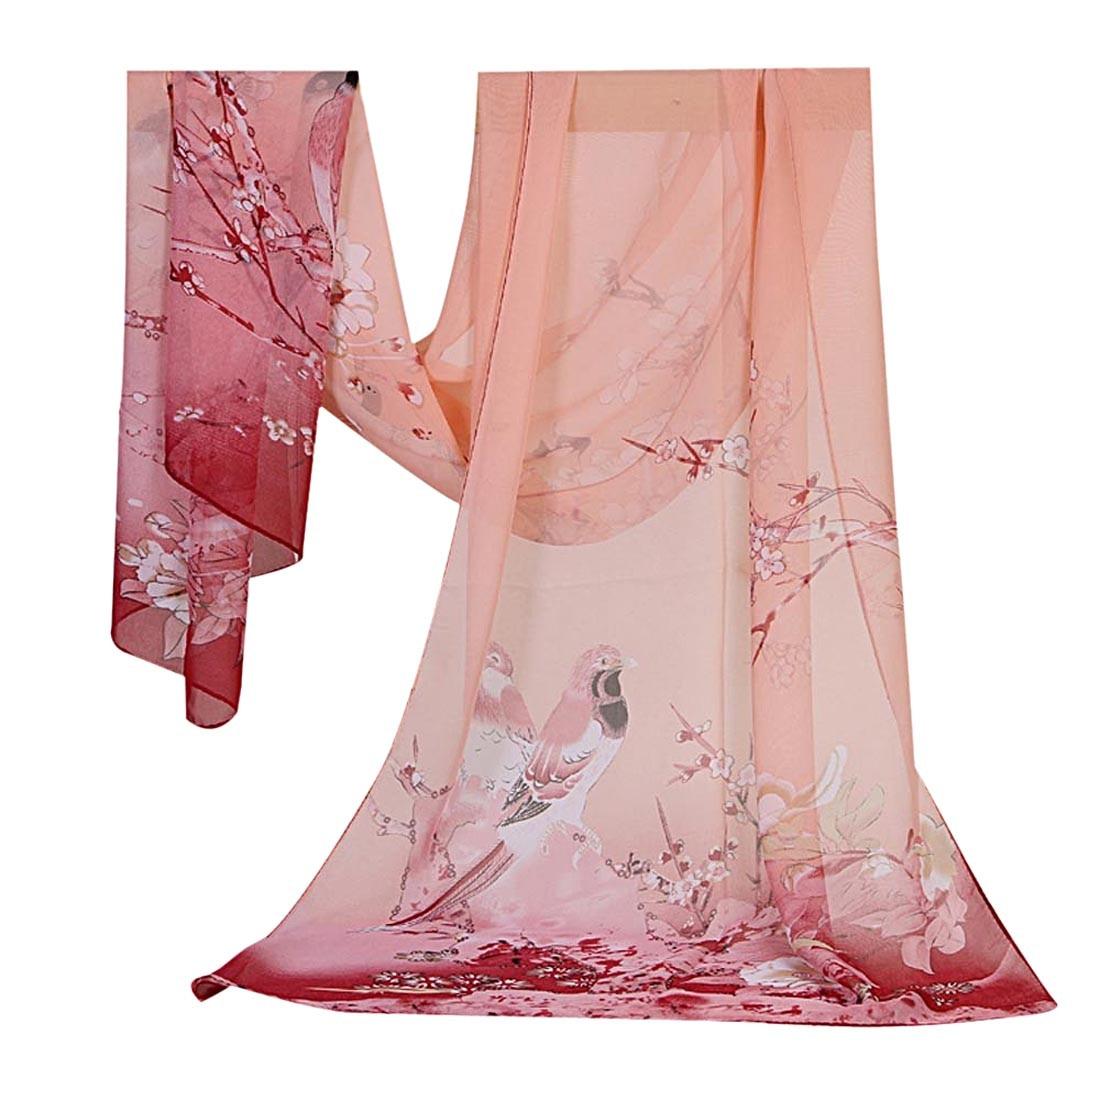 2017 fashion New Arrival winter scarf Chiffon Soft Neck Elegant Shawl Scarves Stole Wraps scarf luxury brand Chiffon scarves